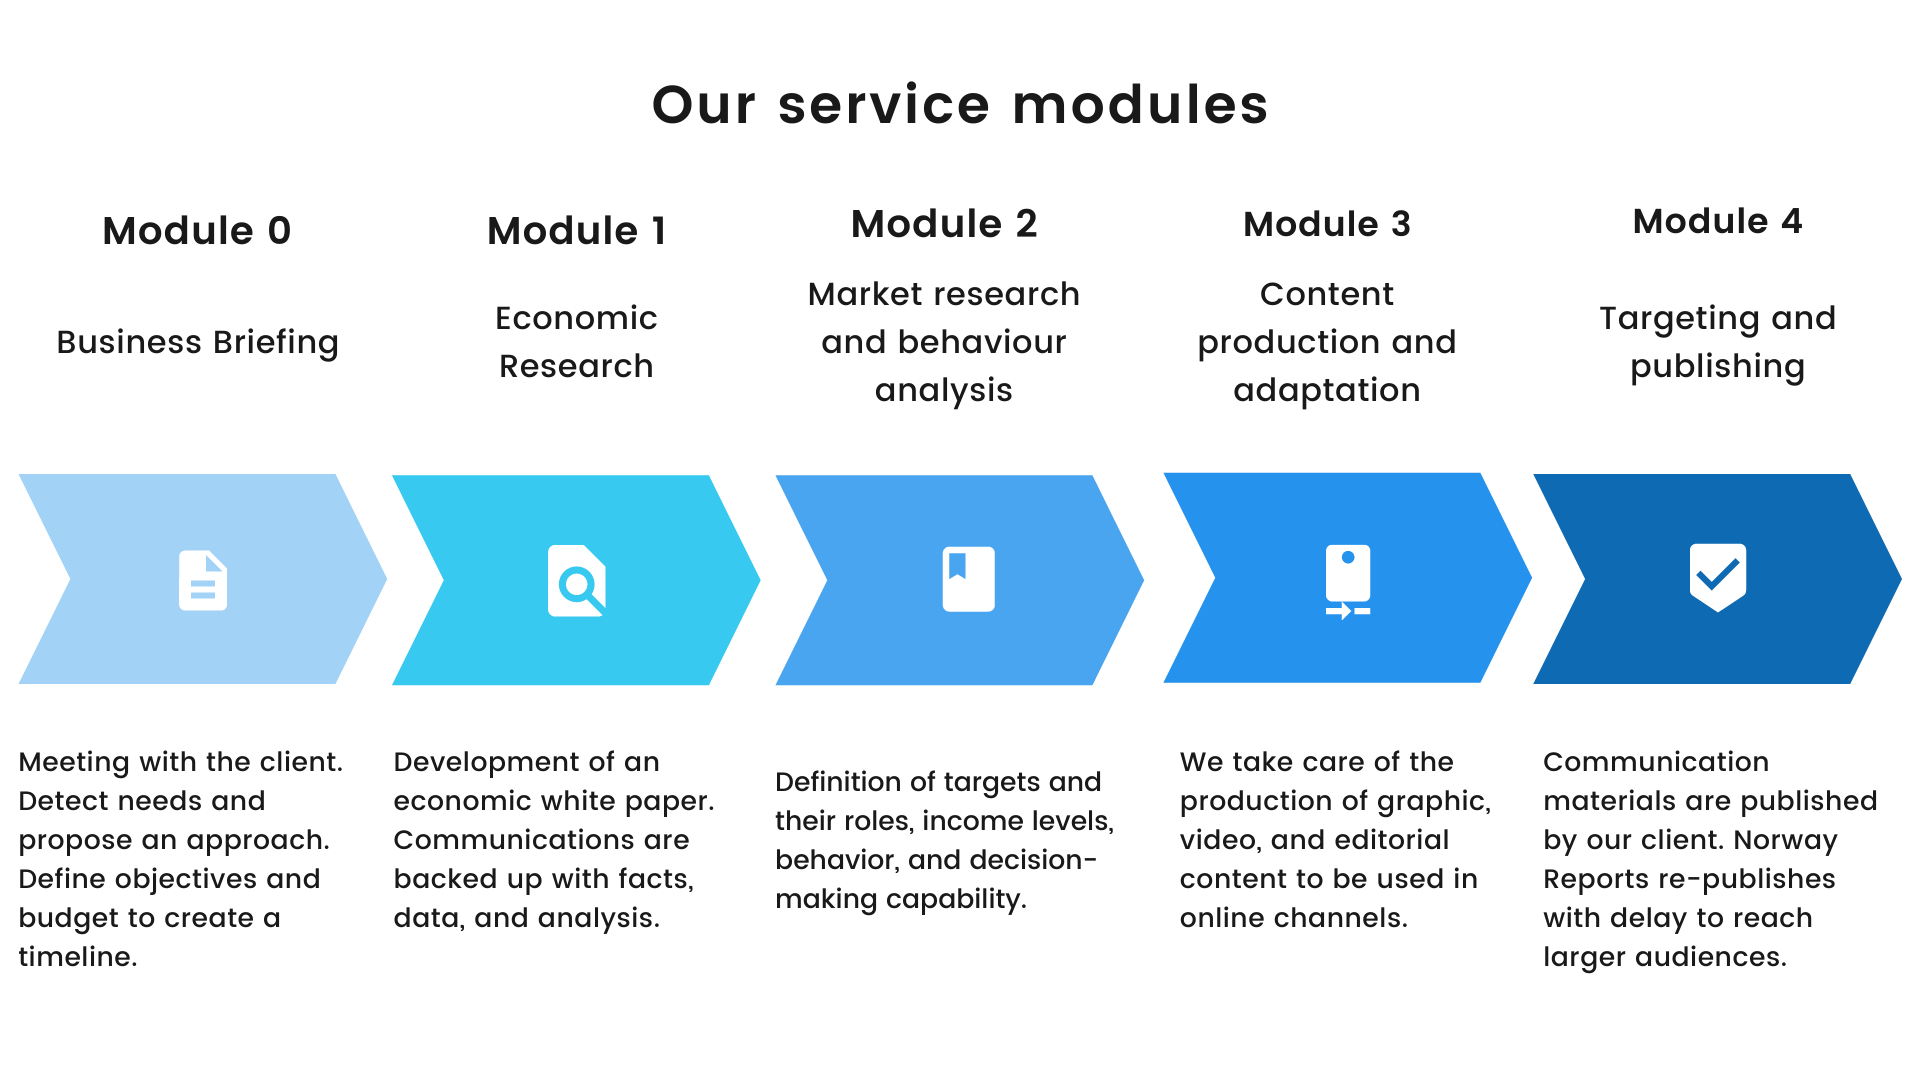 Our service modules - Transparent